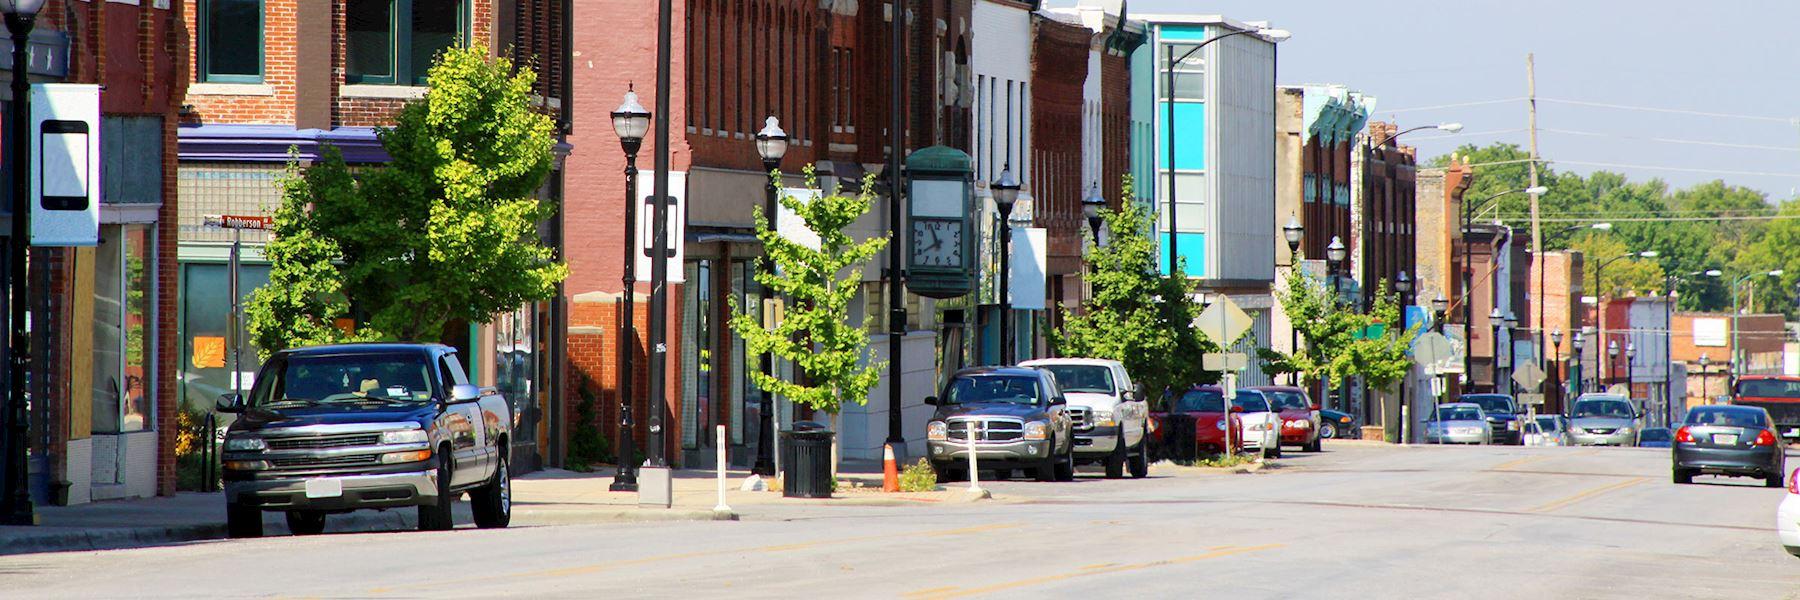 Visit Springfield, Missouri, USA